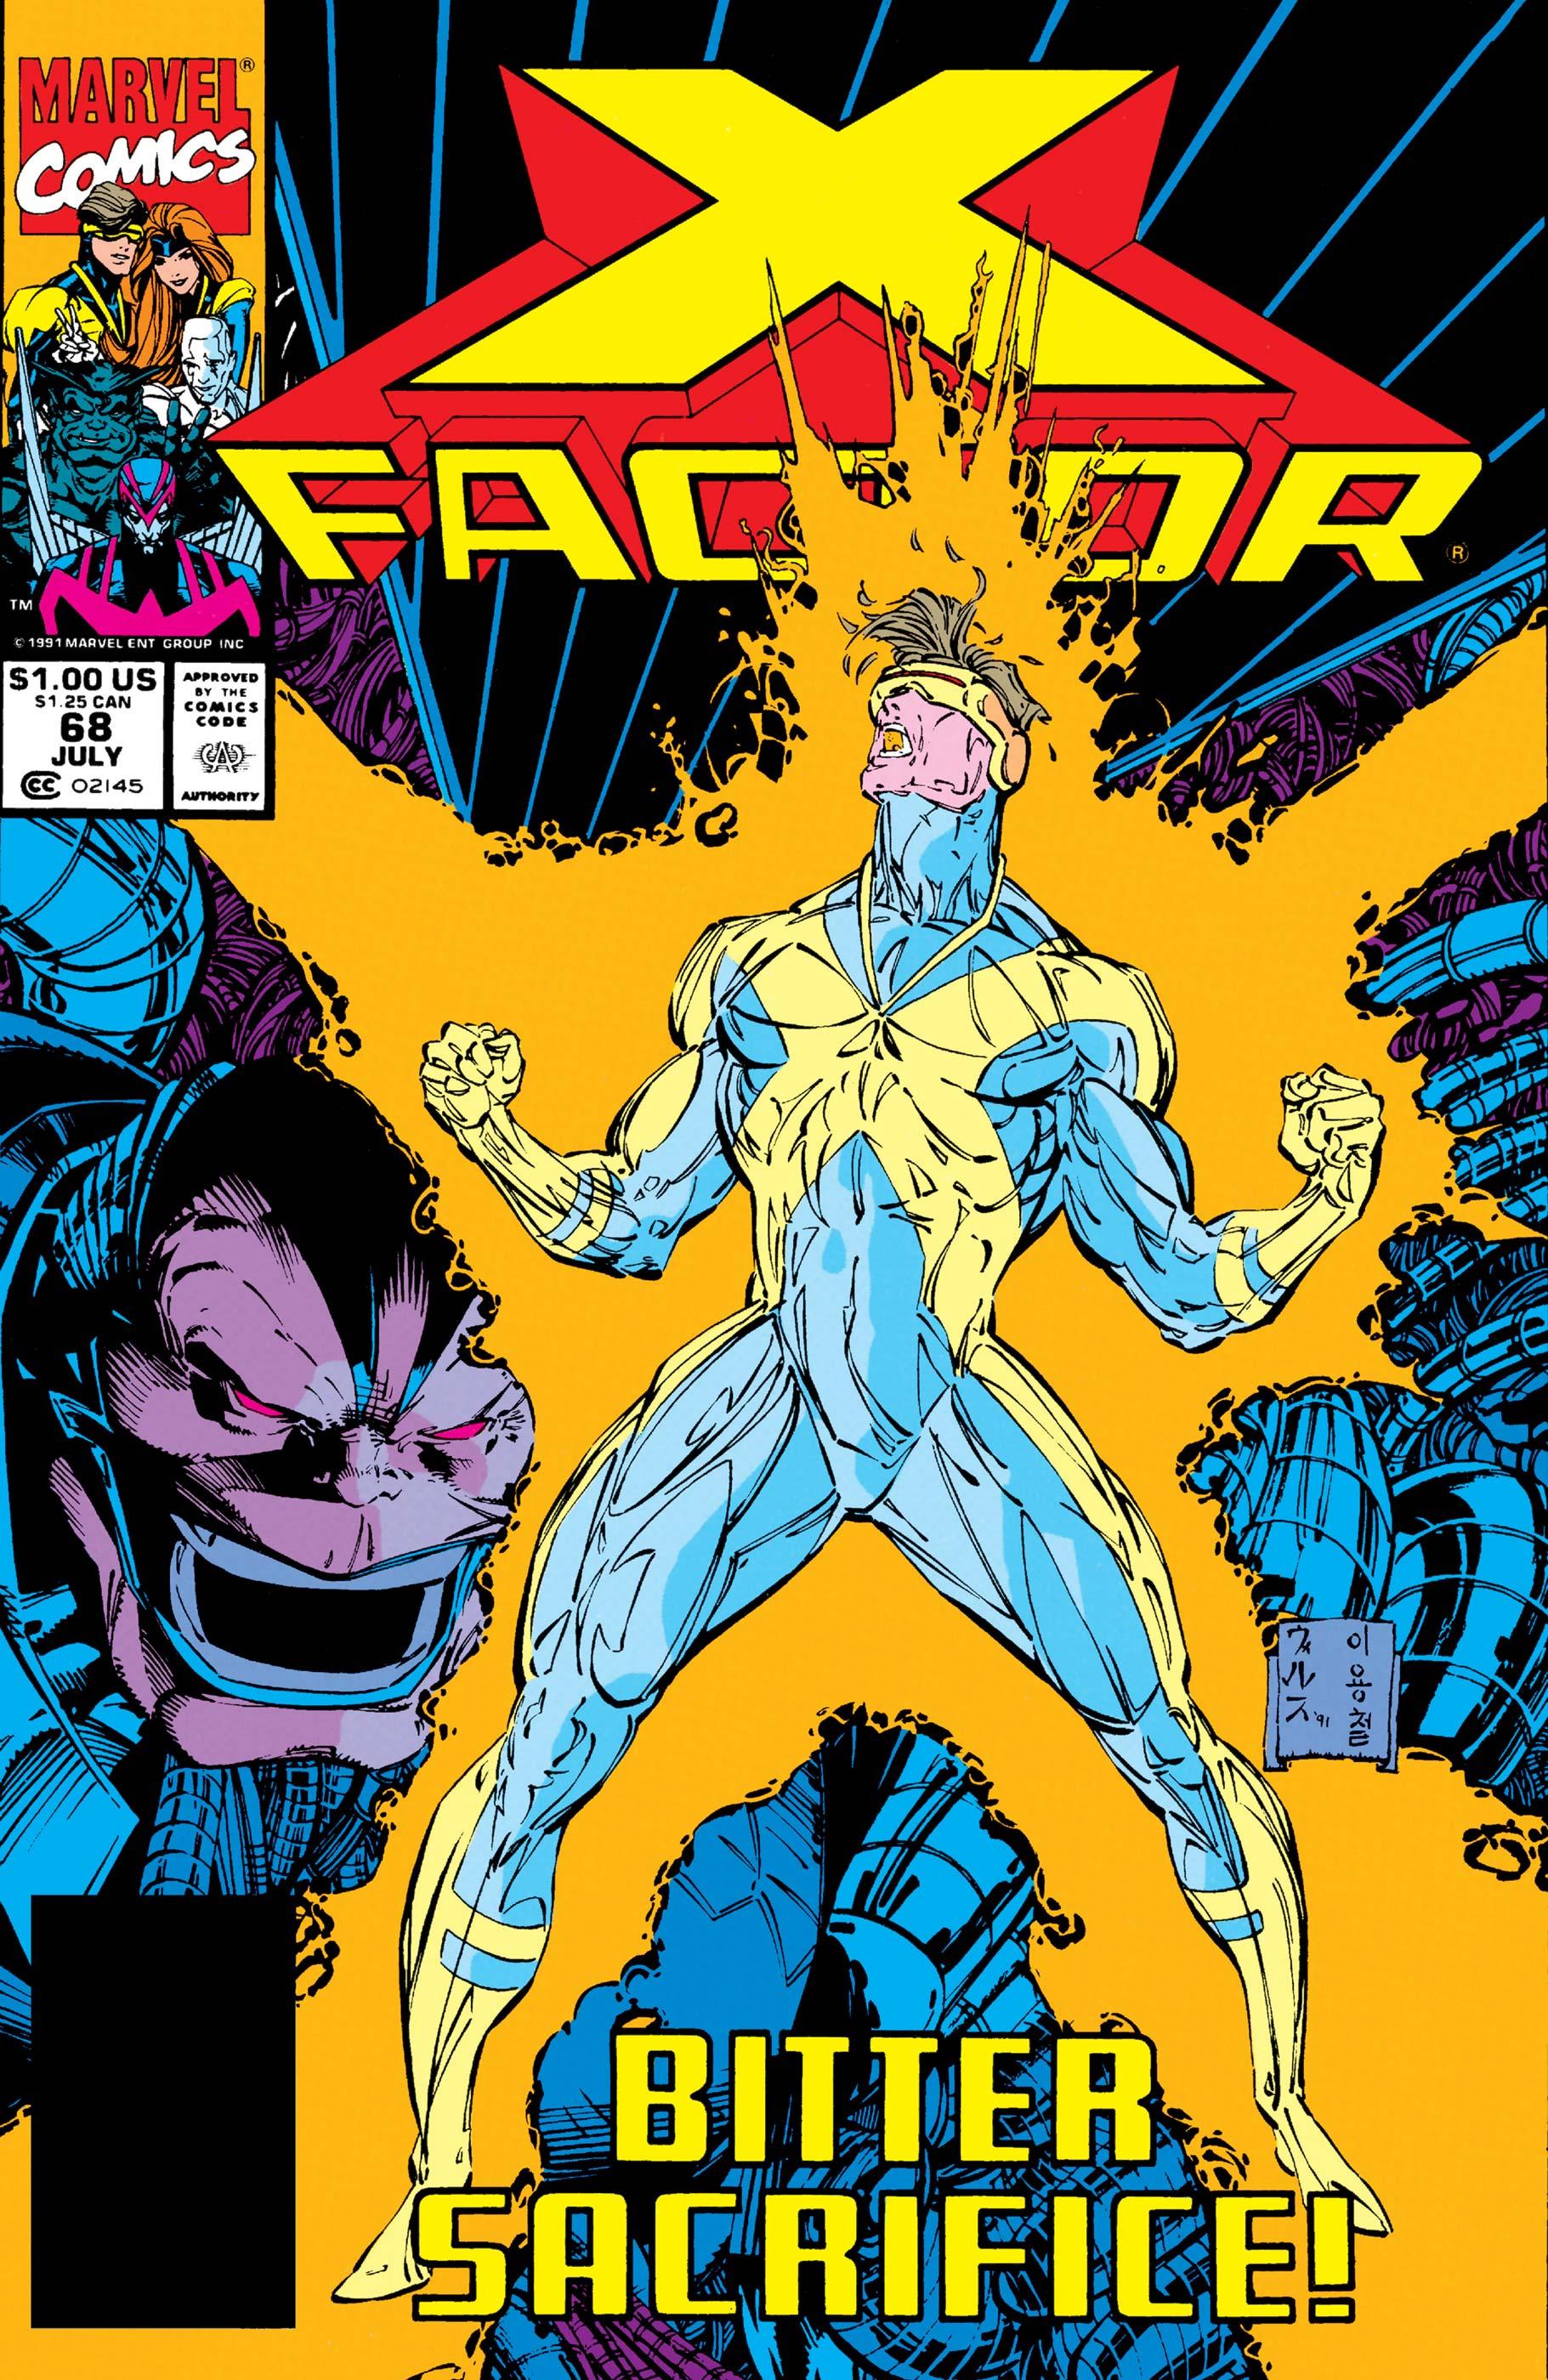 X-Factor (1986) #68